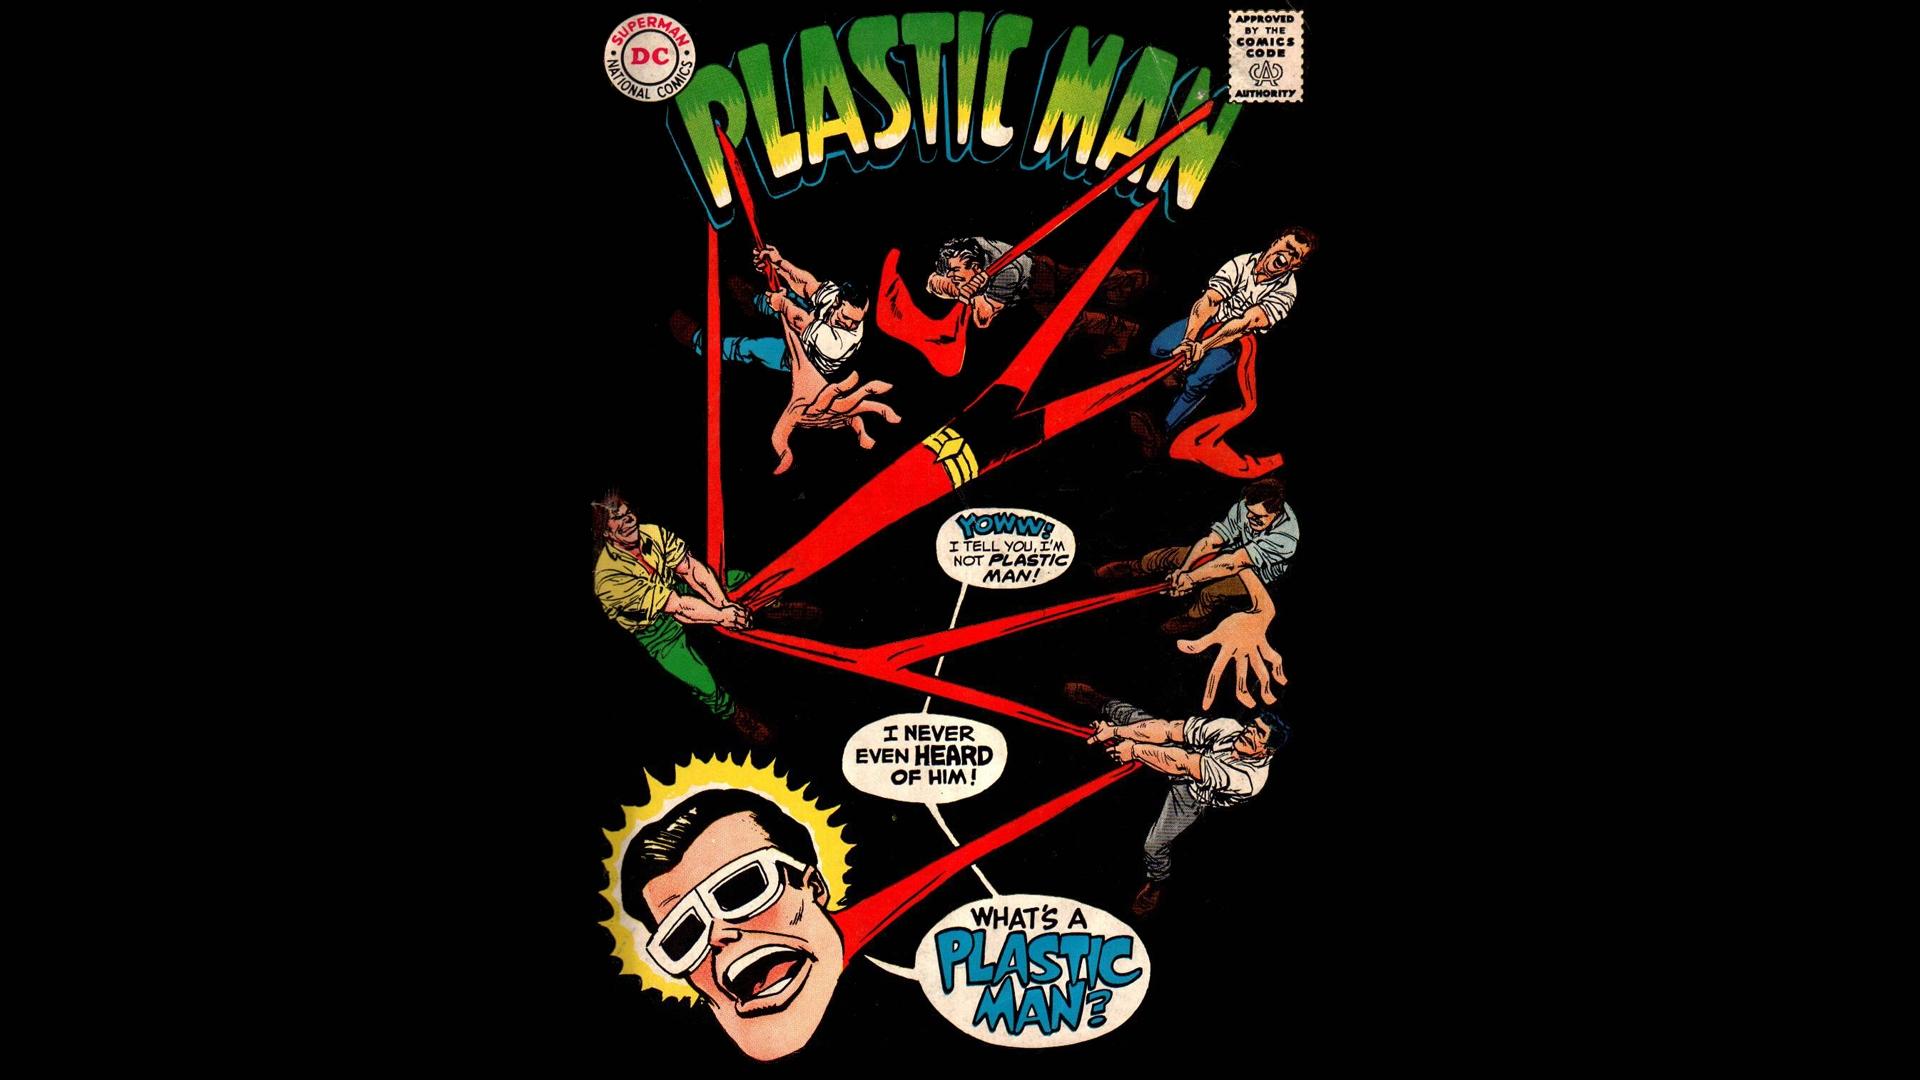 Plastic Man Wallpaper 2   1920 X 1080 stmednet 1920x1080